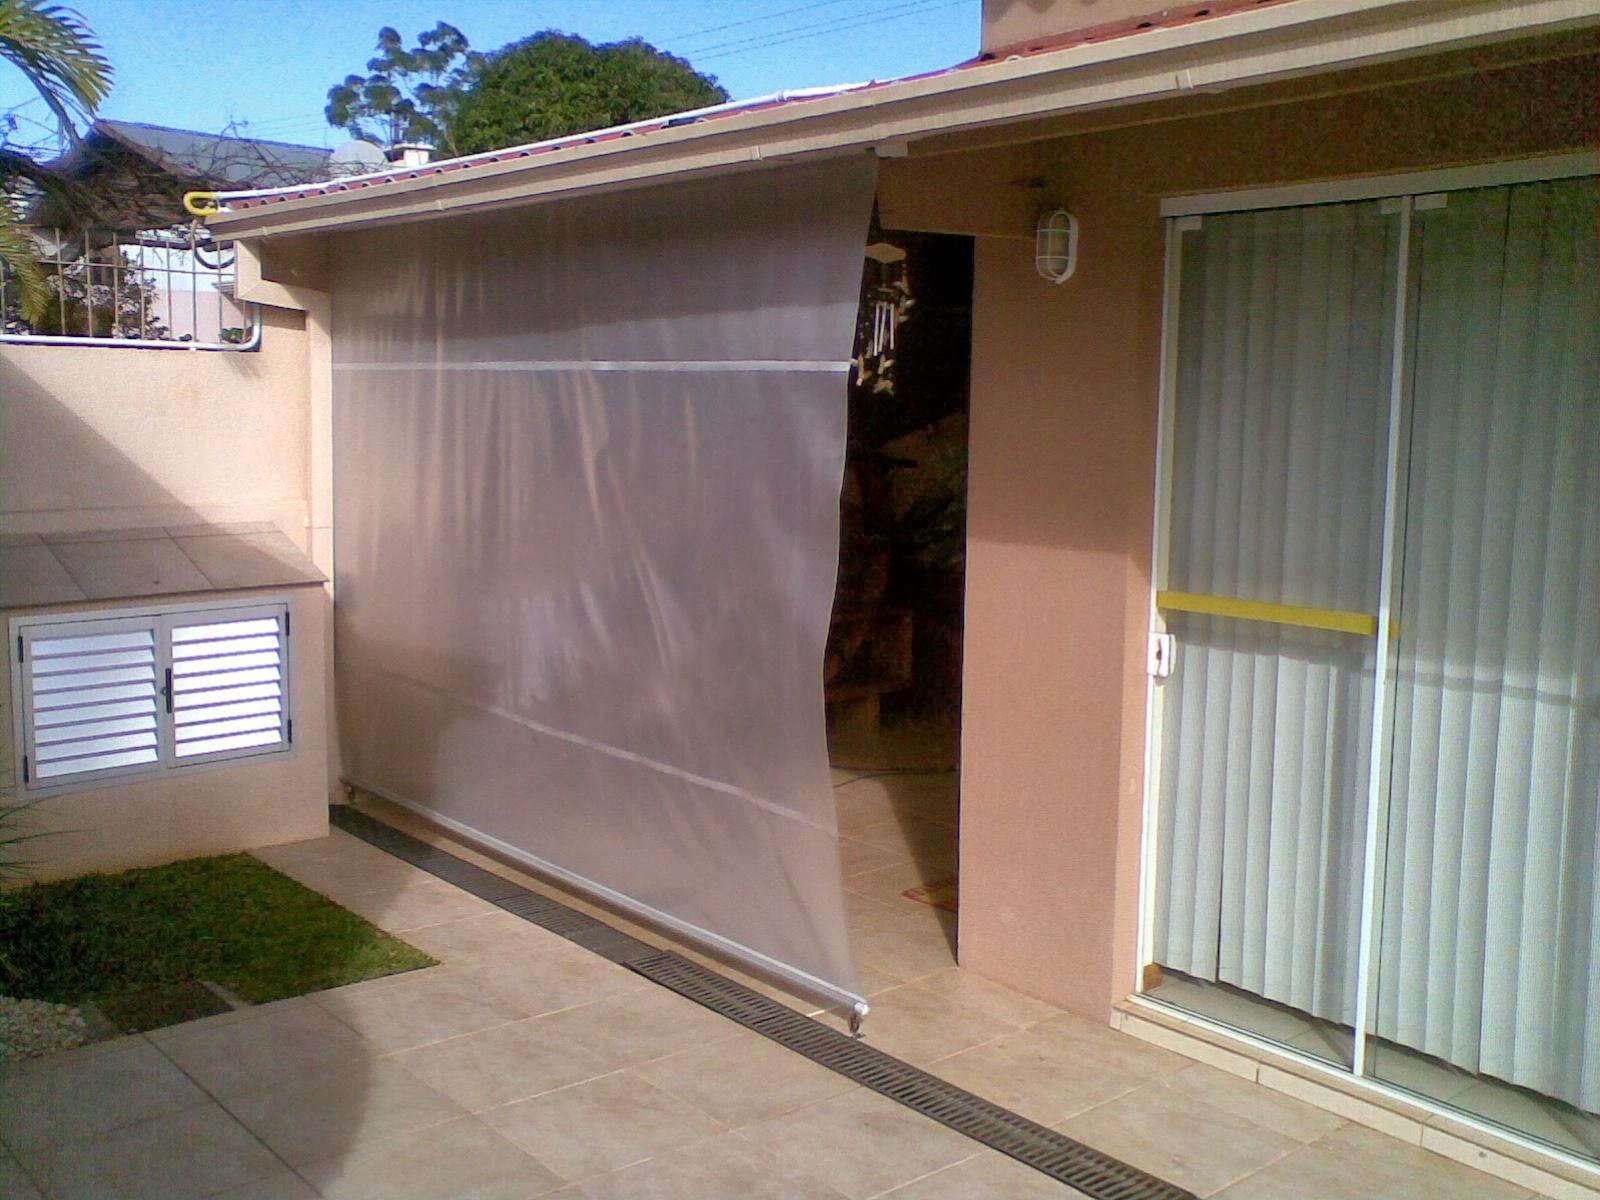 Transl cido ou transparente toldo retr til - Modelos de toldos para patios ...